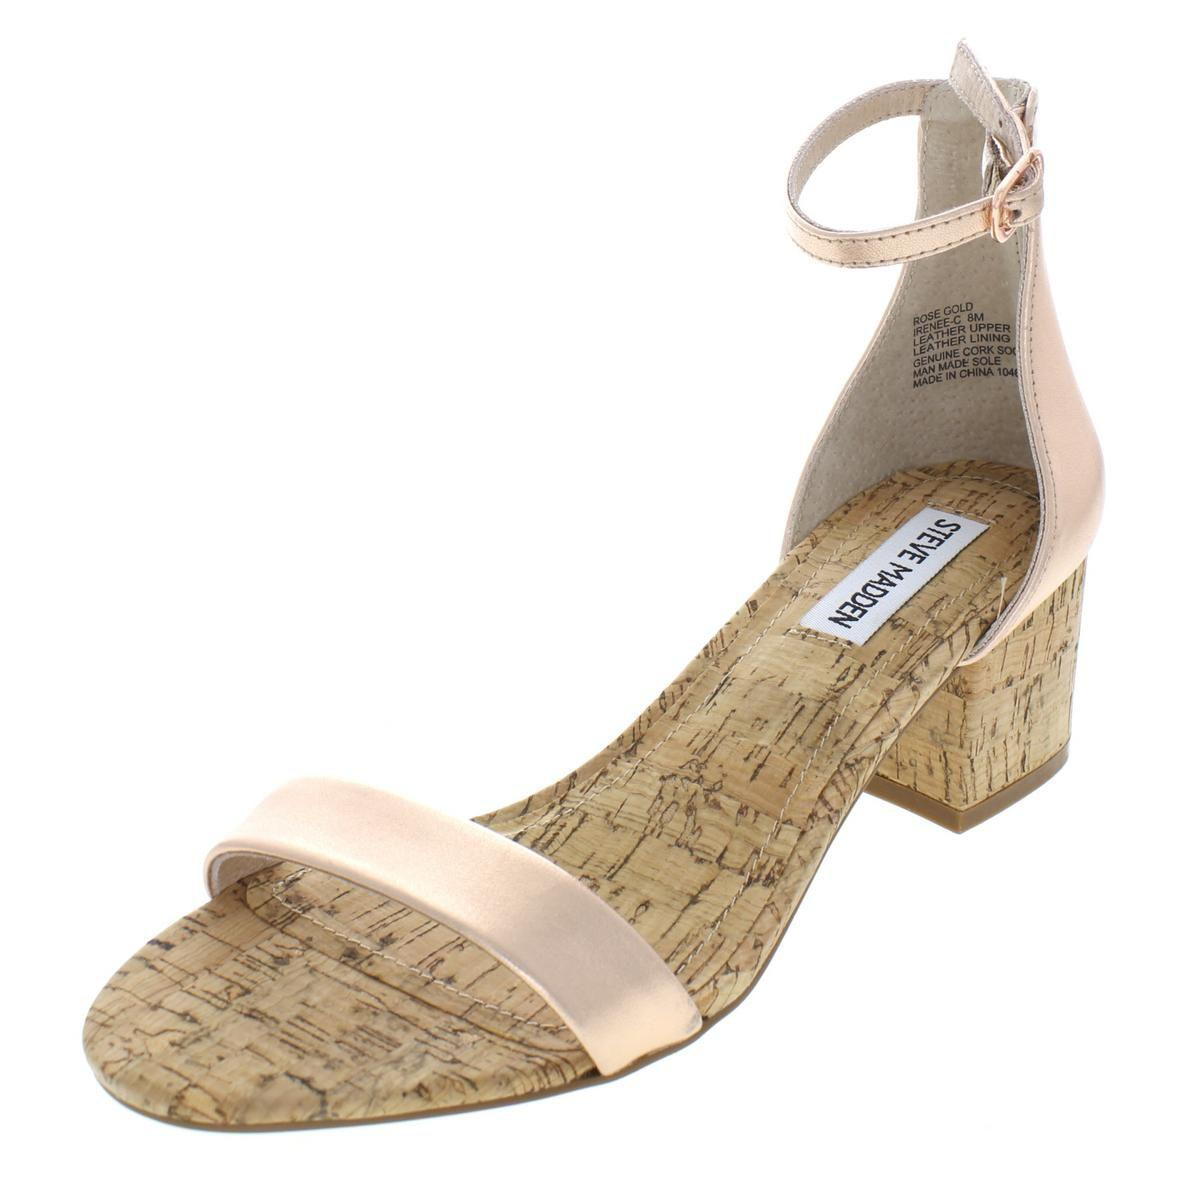 00f293262a Lyst - Steve Madden Womens Irenee-c Cork Dress Sandals in Metallic